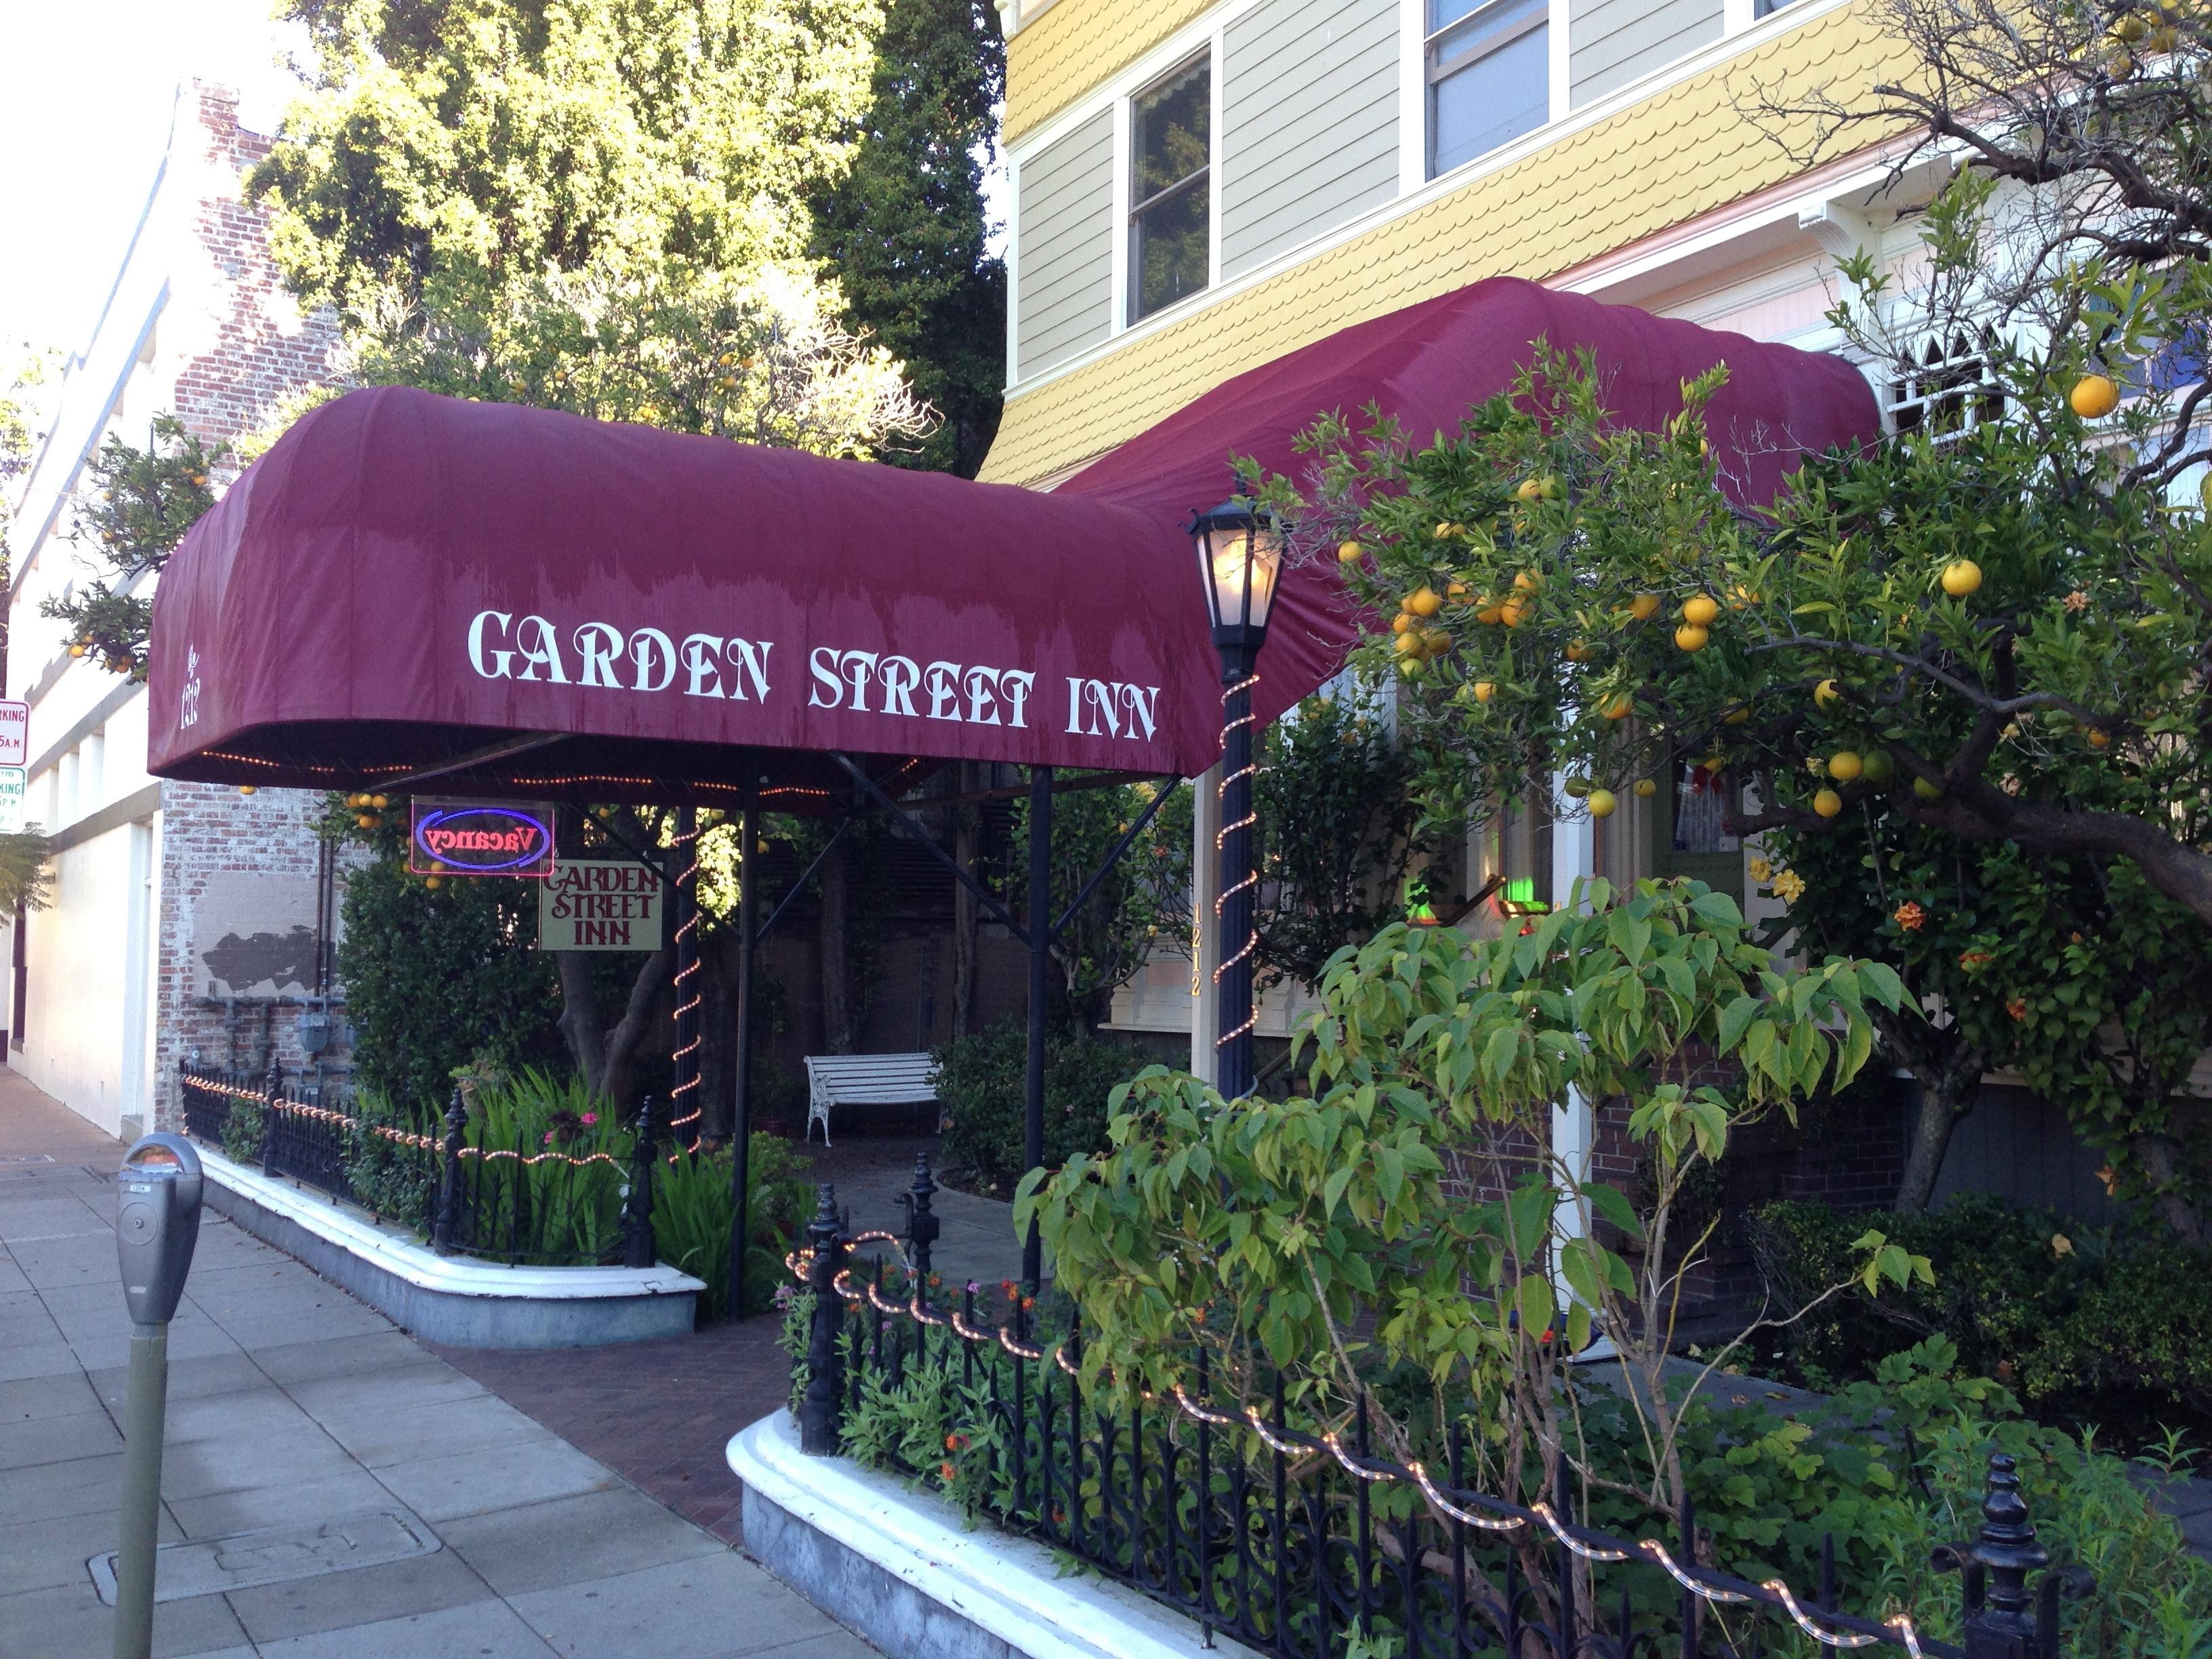 Garden Street Inn